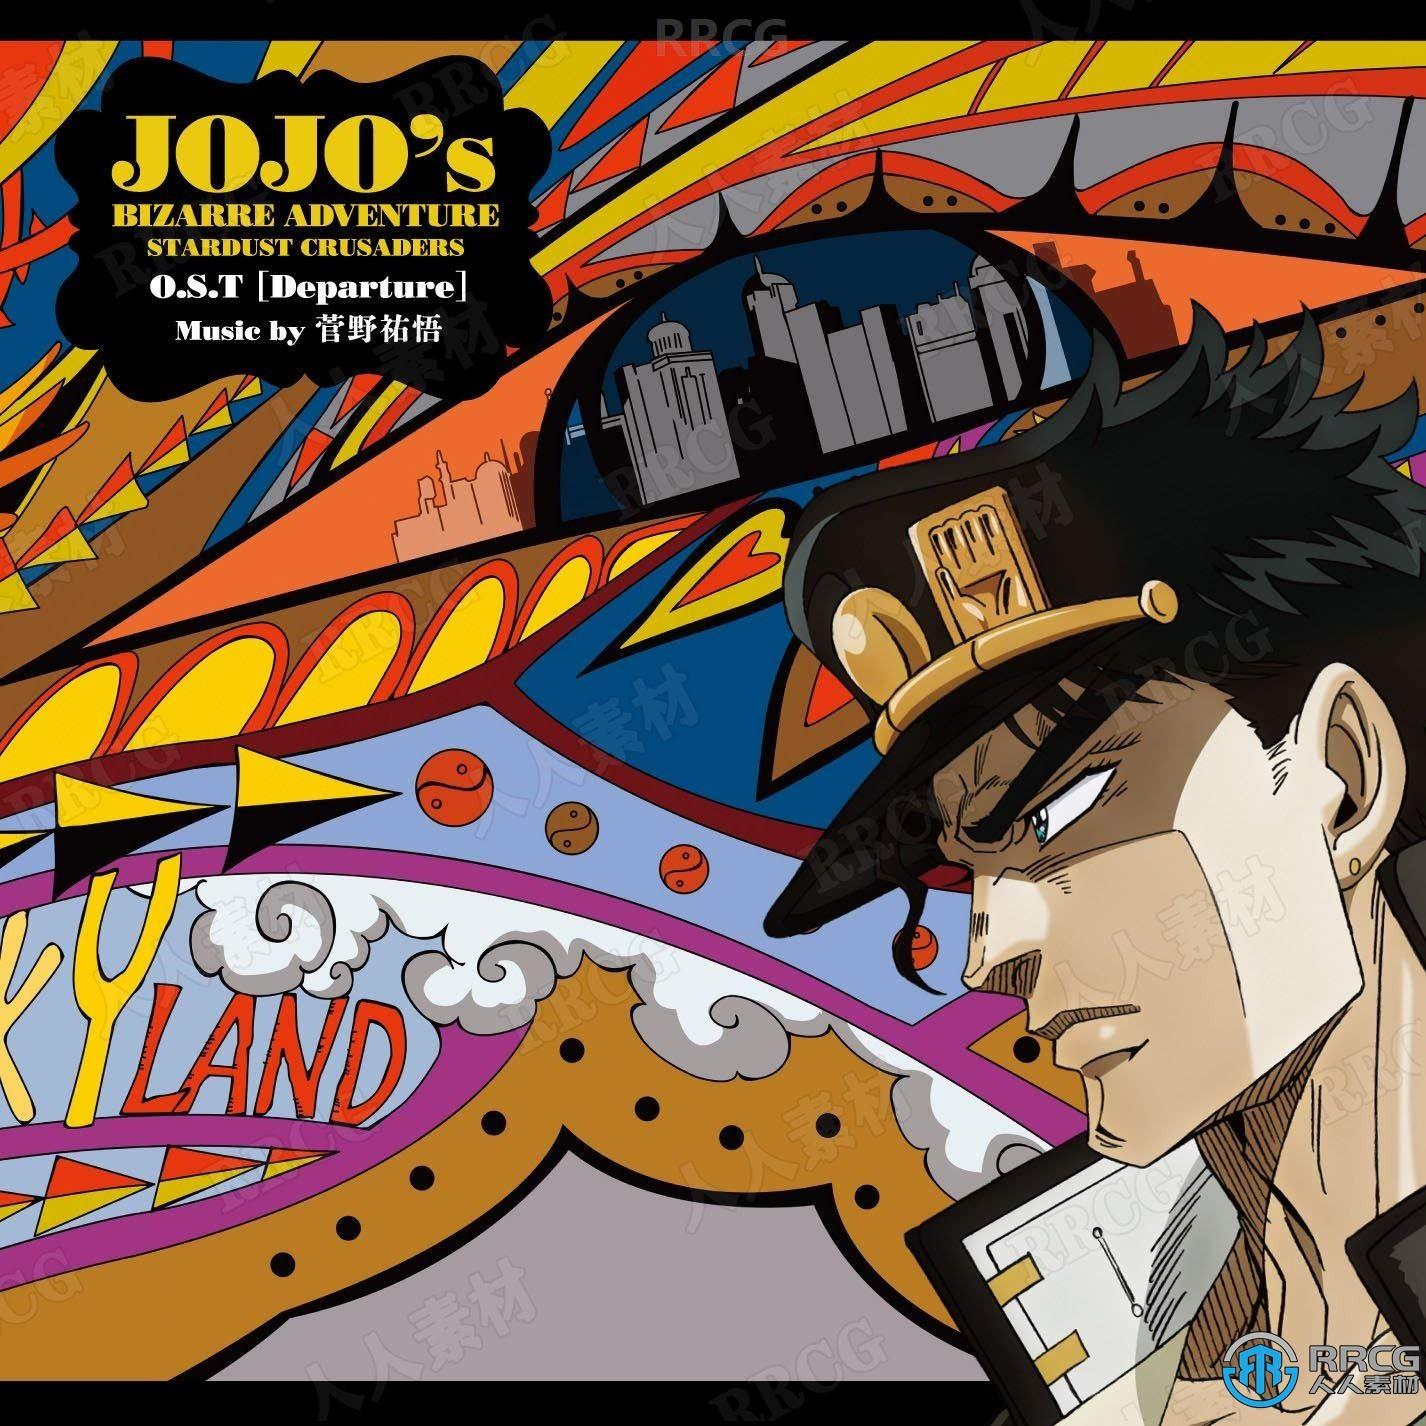 JOJO的奇妙冒险 星尘斗士动画配乐原声大碟OST音乐素材合集